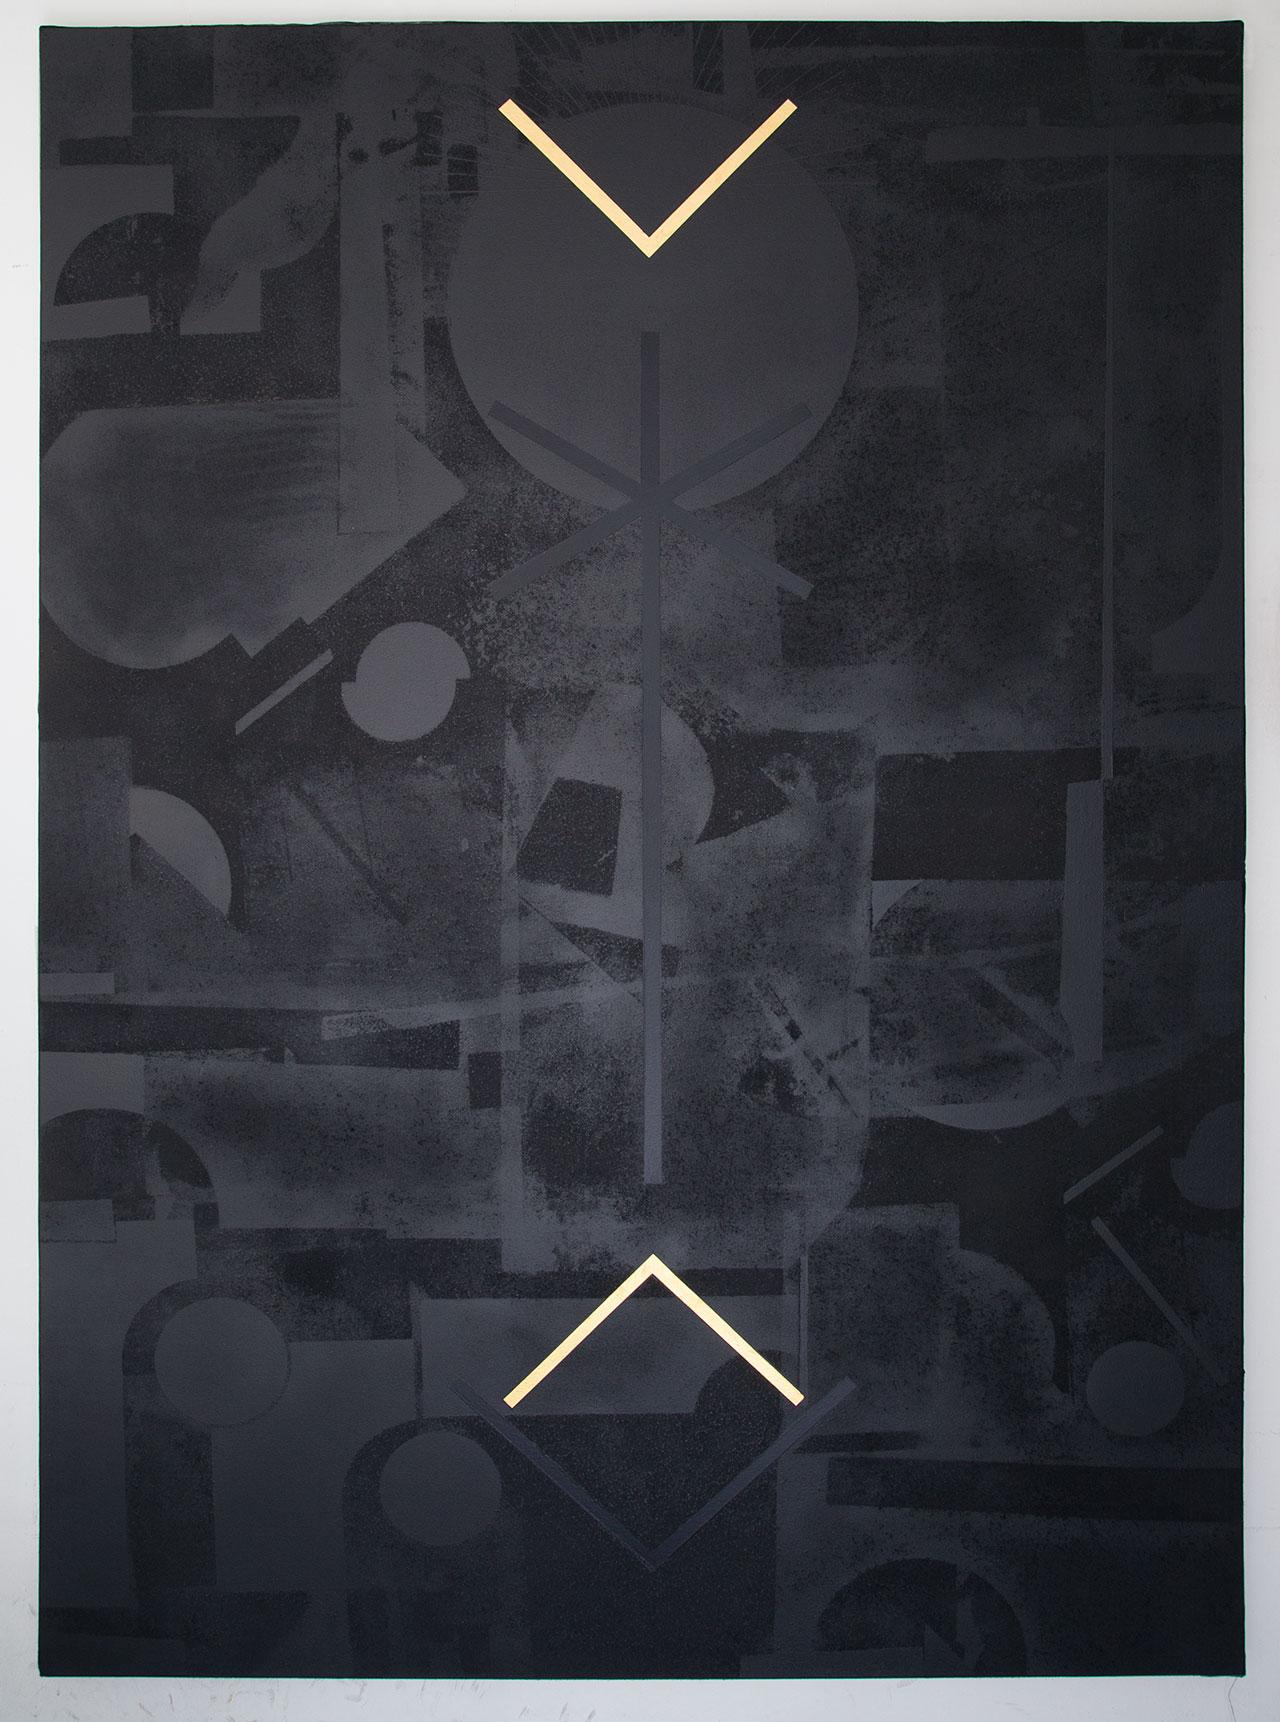 Panos Tsagaris,Untitled, gold leaf, acrylic paint, spray paint and silkscreen on canvas, 180 x 130 cm, 2016. Courtesy of the artist, MLFIMarie-Laure Fleisch, (Rome-Brussels)Kalfayan Galleries, (Athens-Thessaloniki).